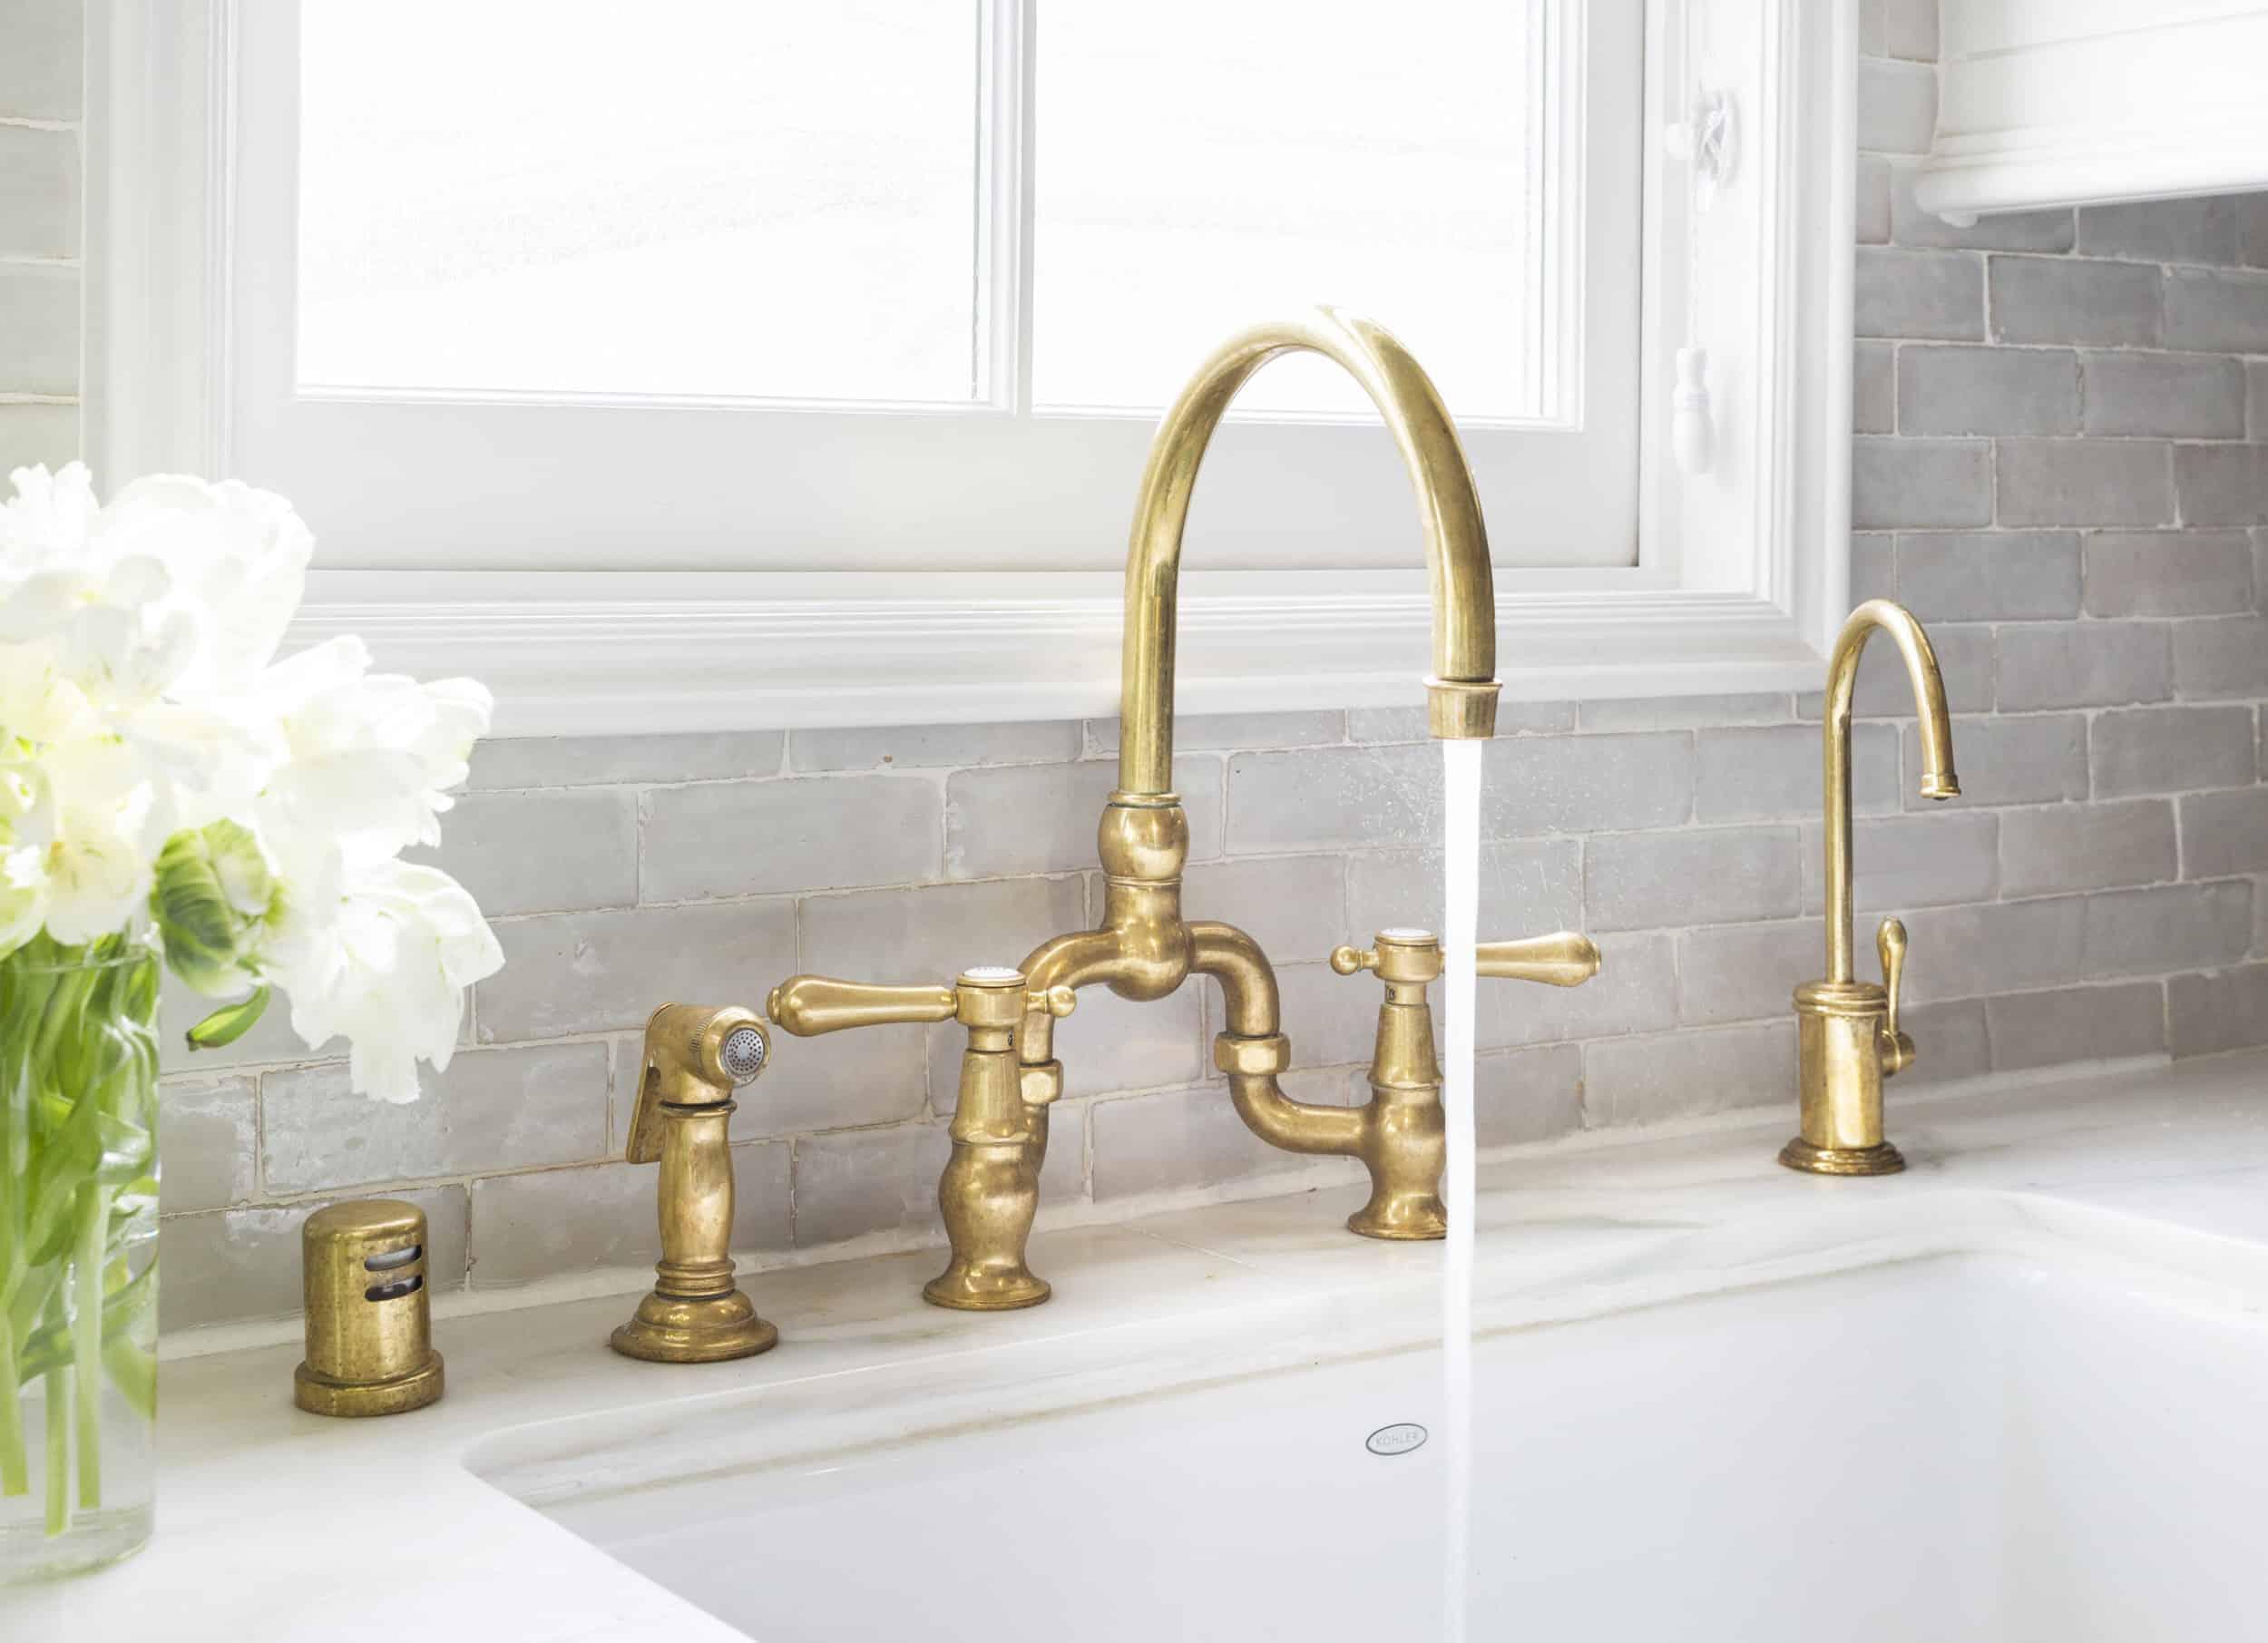 Emily Henderson Culligan Water Softner Benefits 15